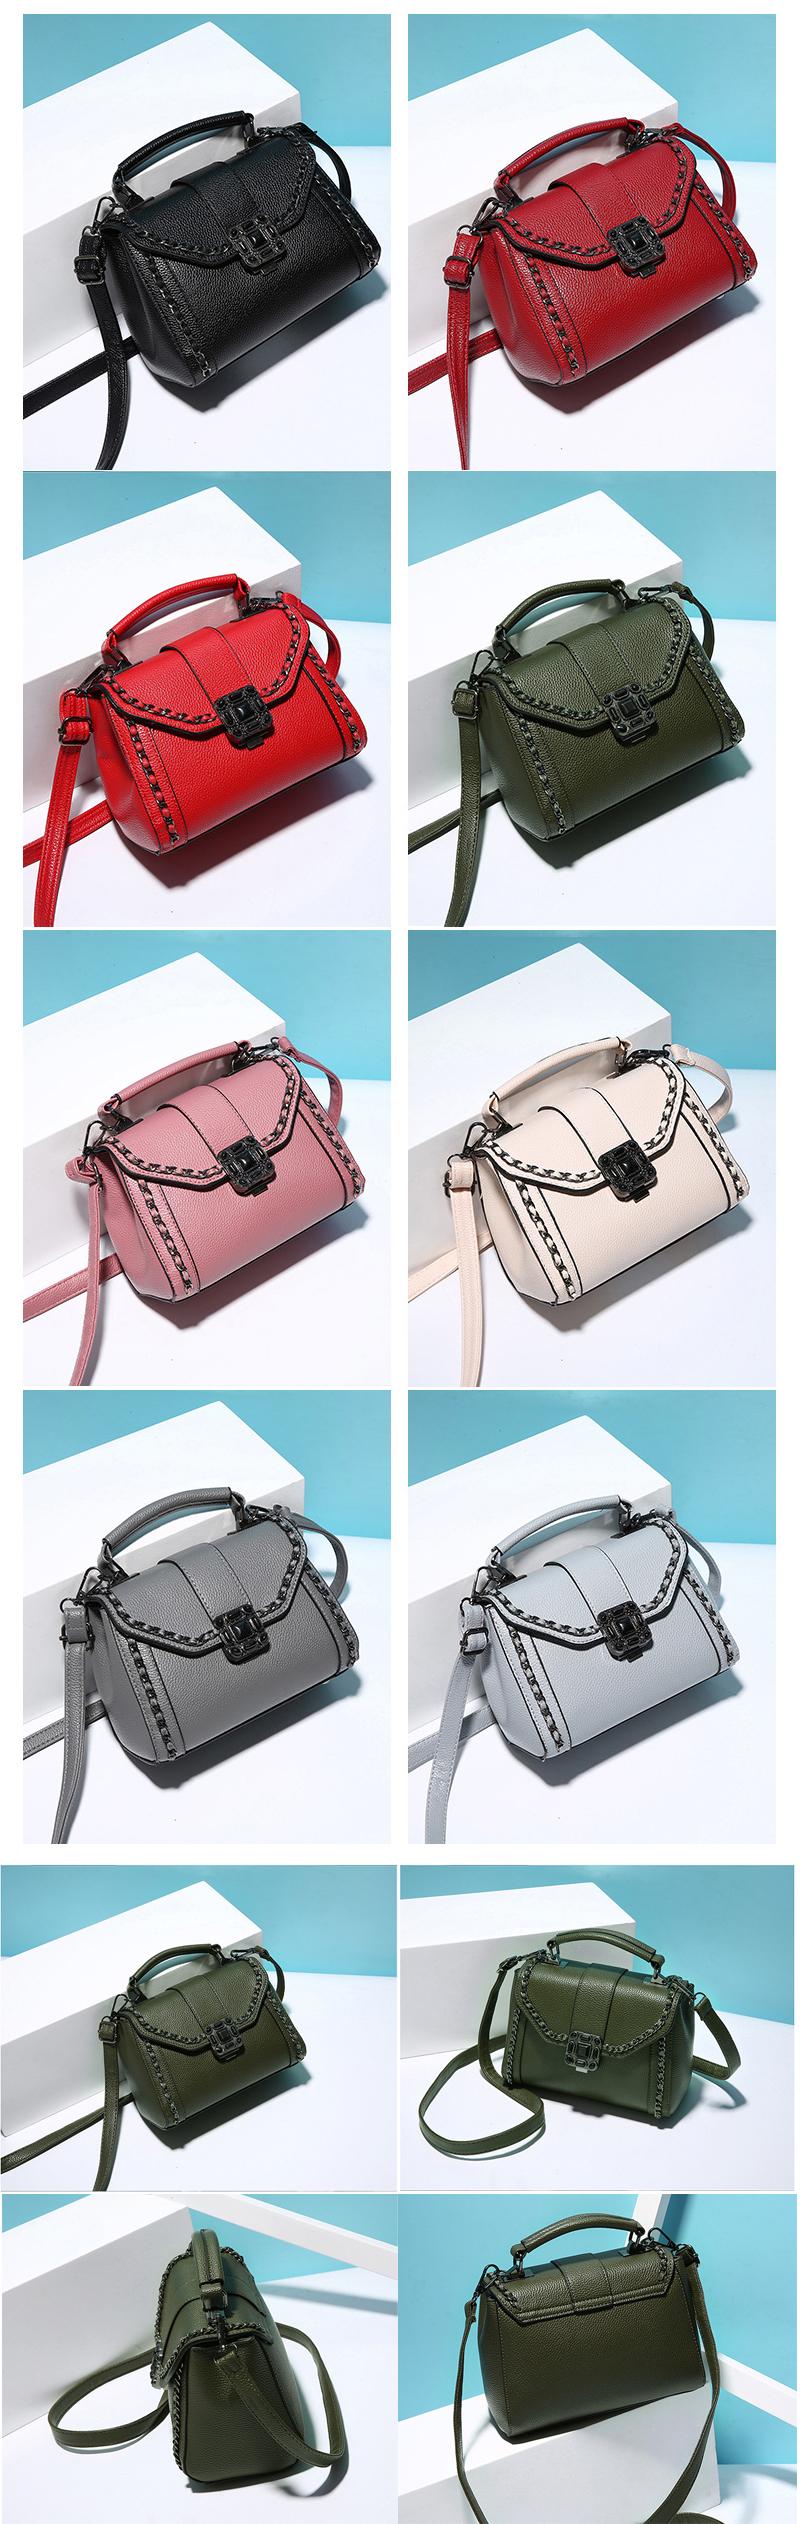 82ee9236b89c8 YOIIOY Women Handbag Small Fashion PU Leather Bags Women Messenger ...